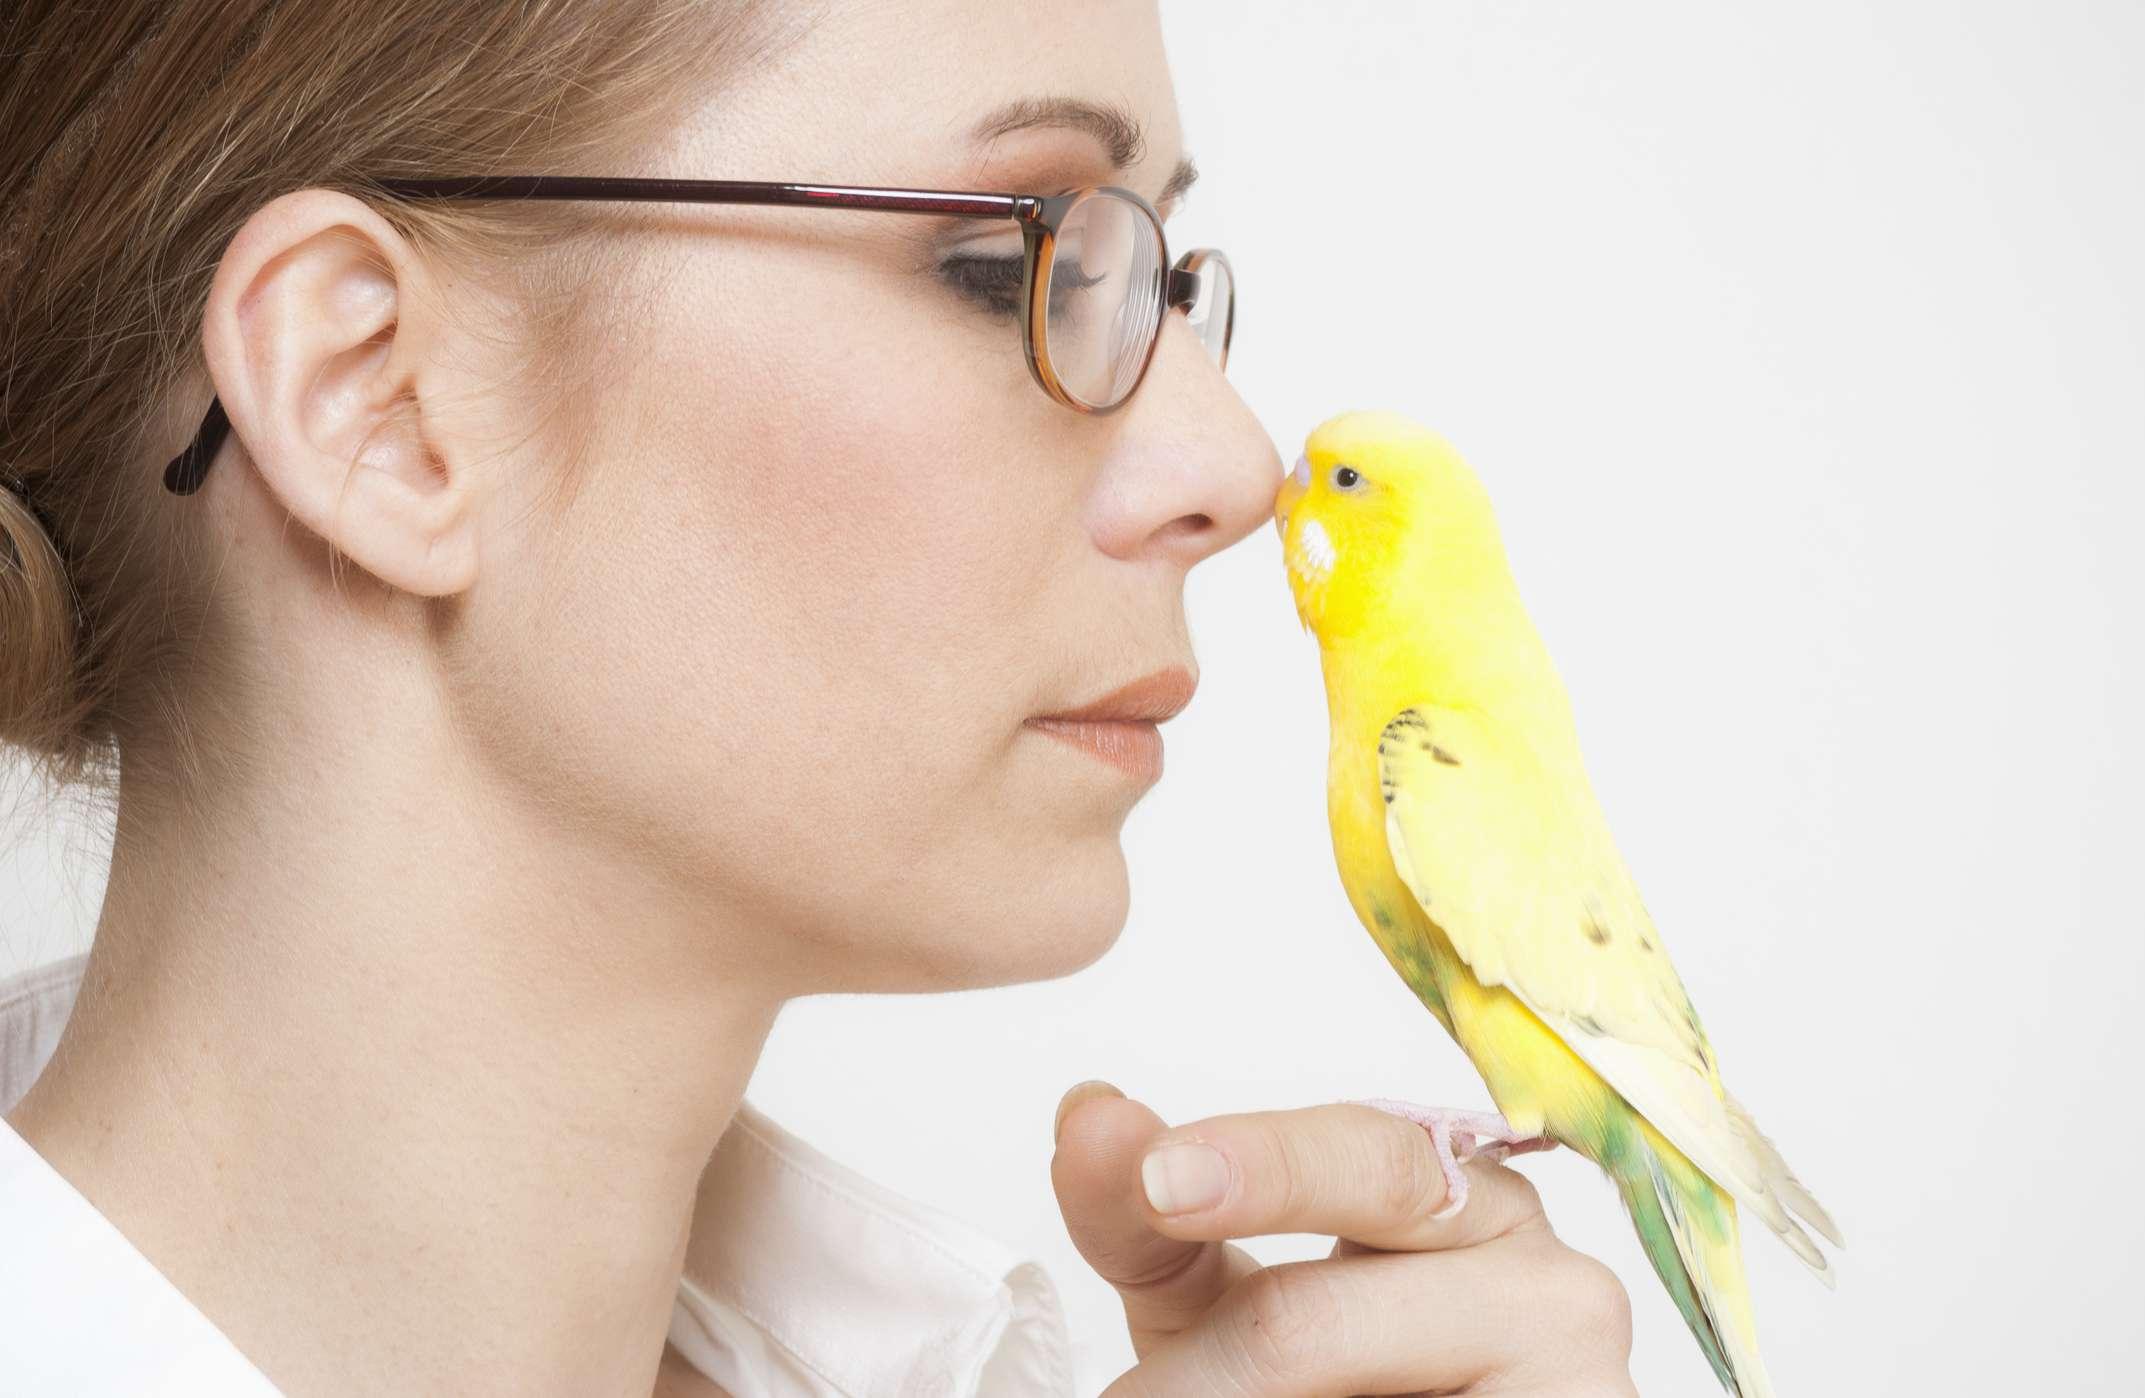 bird bonding with woman